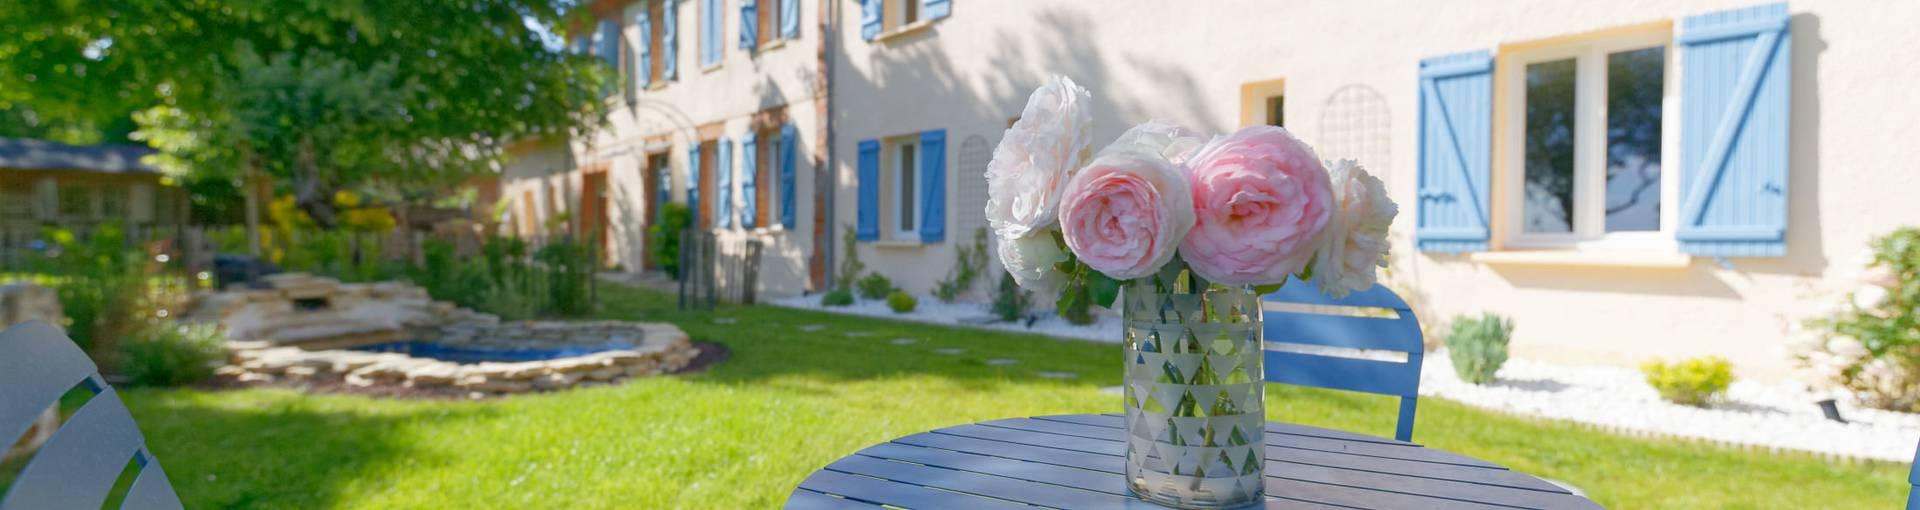 Gite Majorelle de la Maison Bleue, Savignac-Mona, Lombez, Samatan, Savès, Gers, Gascogne, France